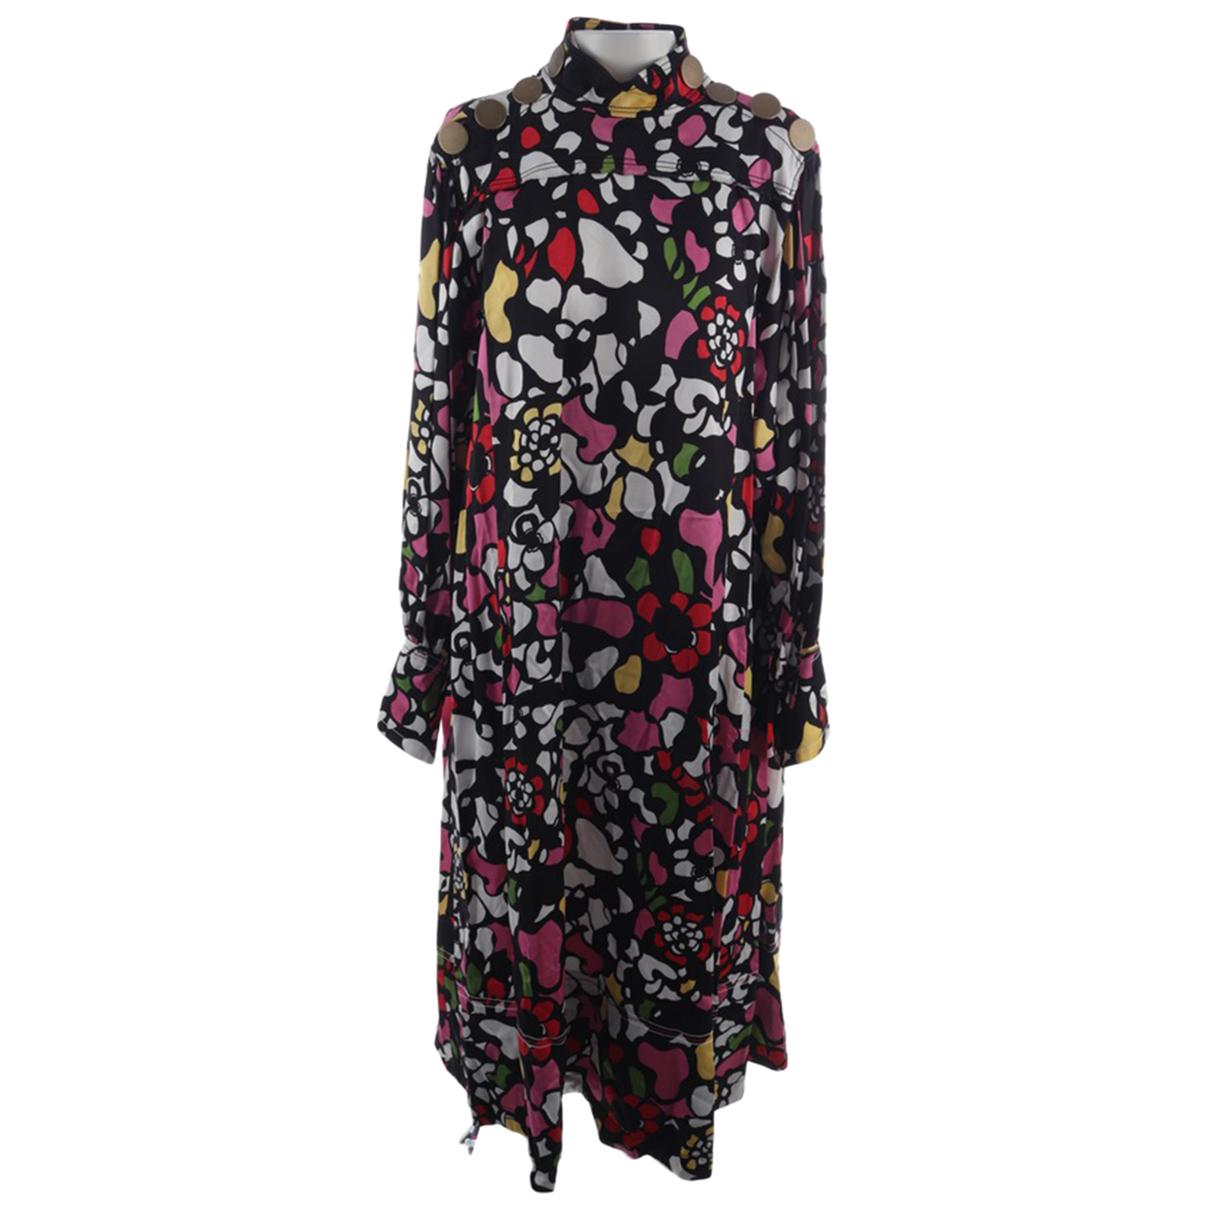 Sonia Rykiel N Black dress for Women 34 FR